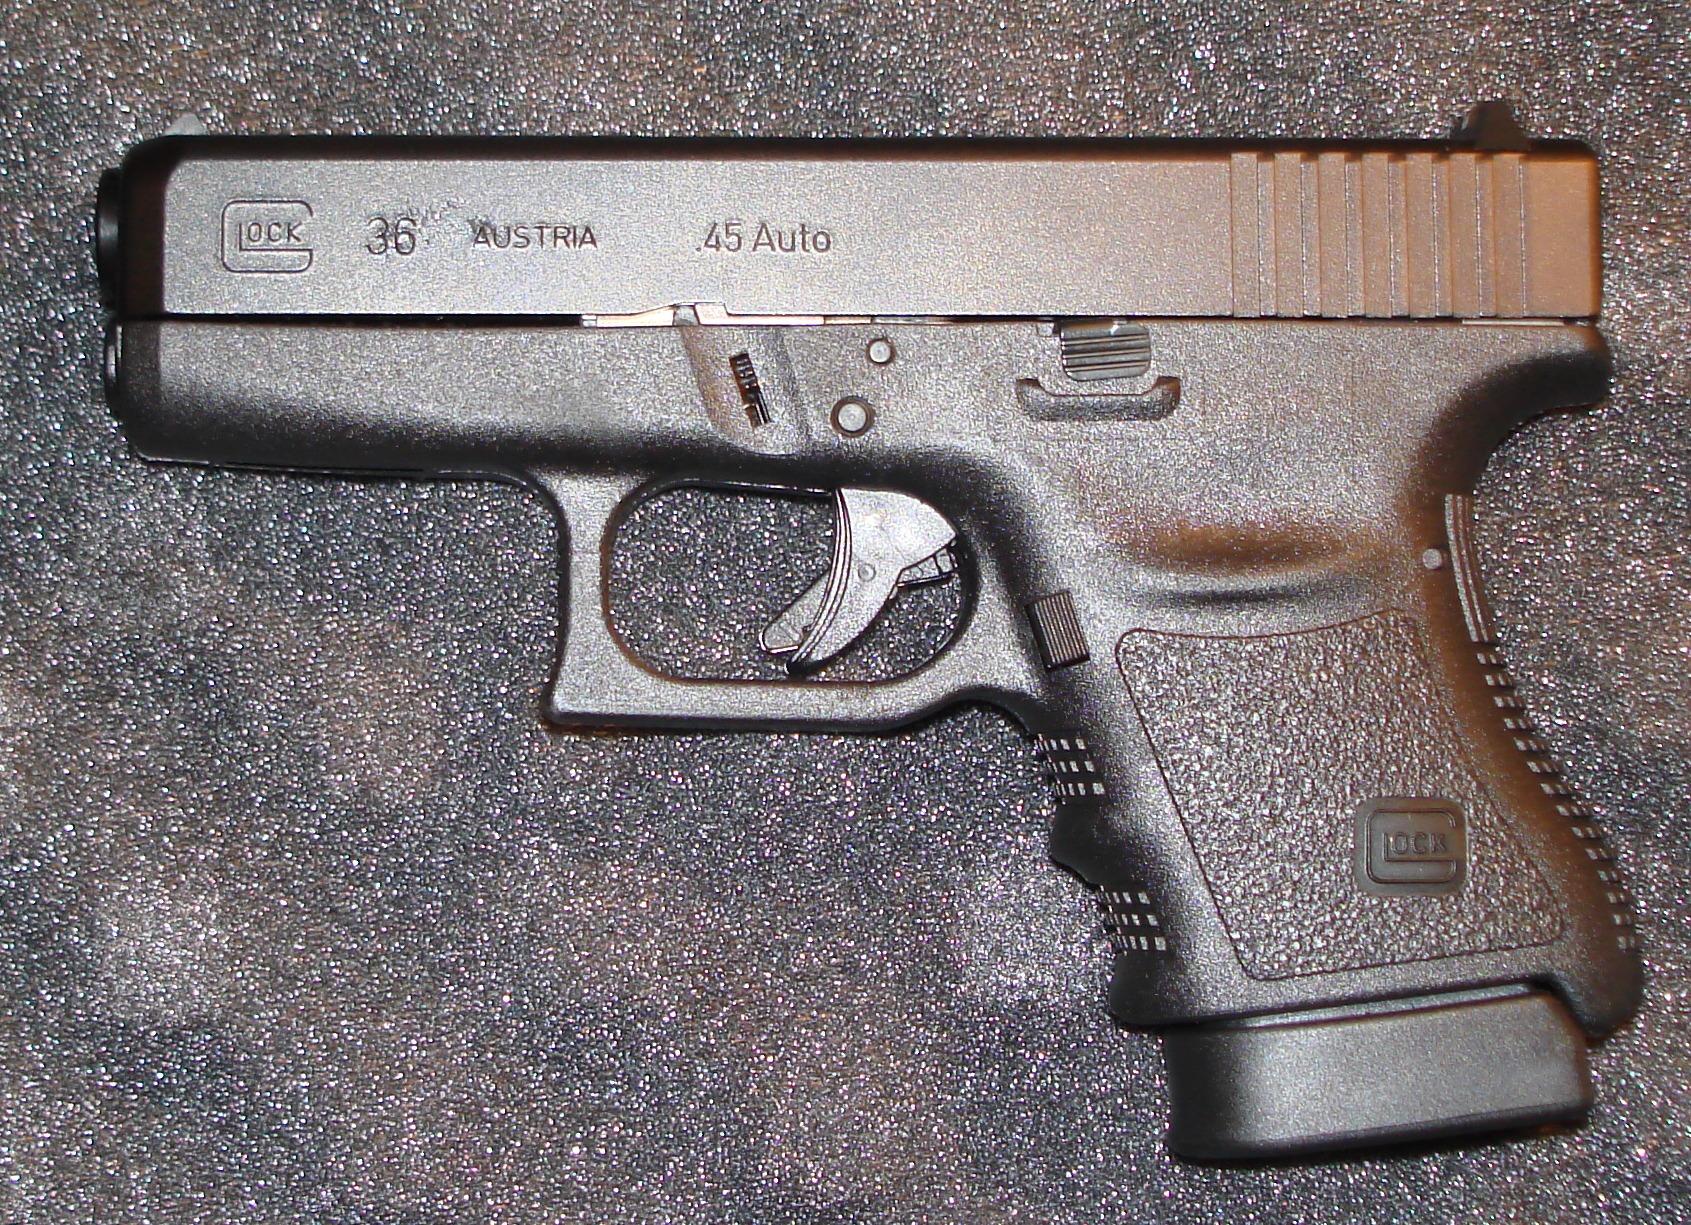 glock 36 - Imágenes - Taringa!